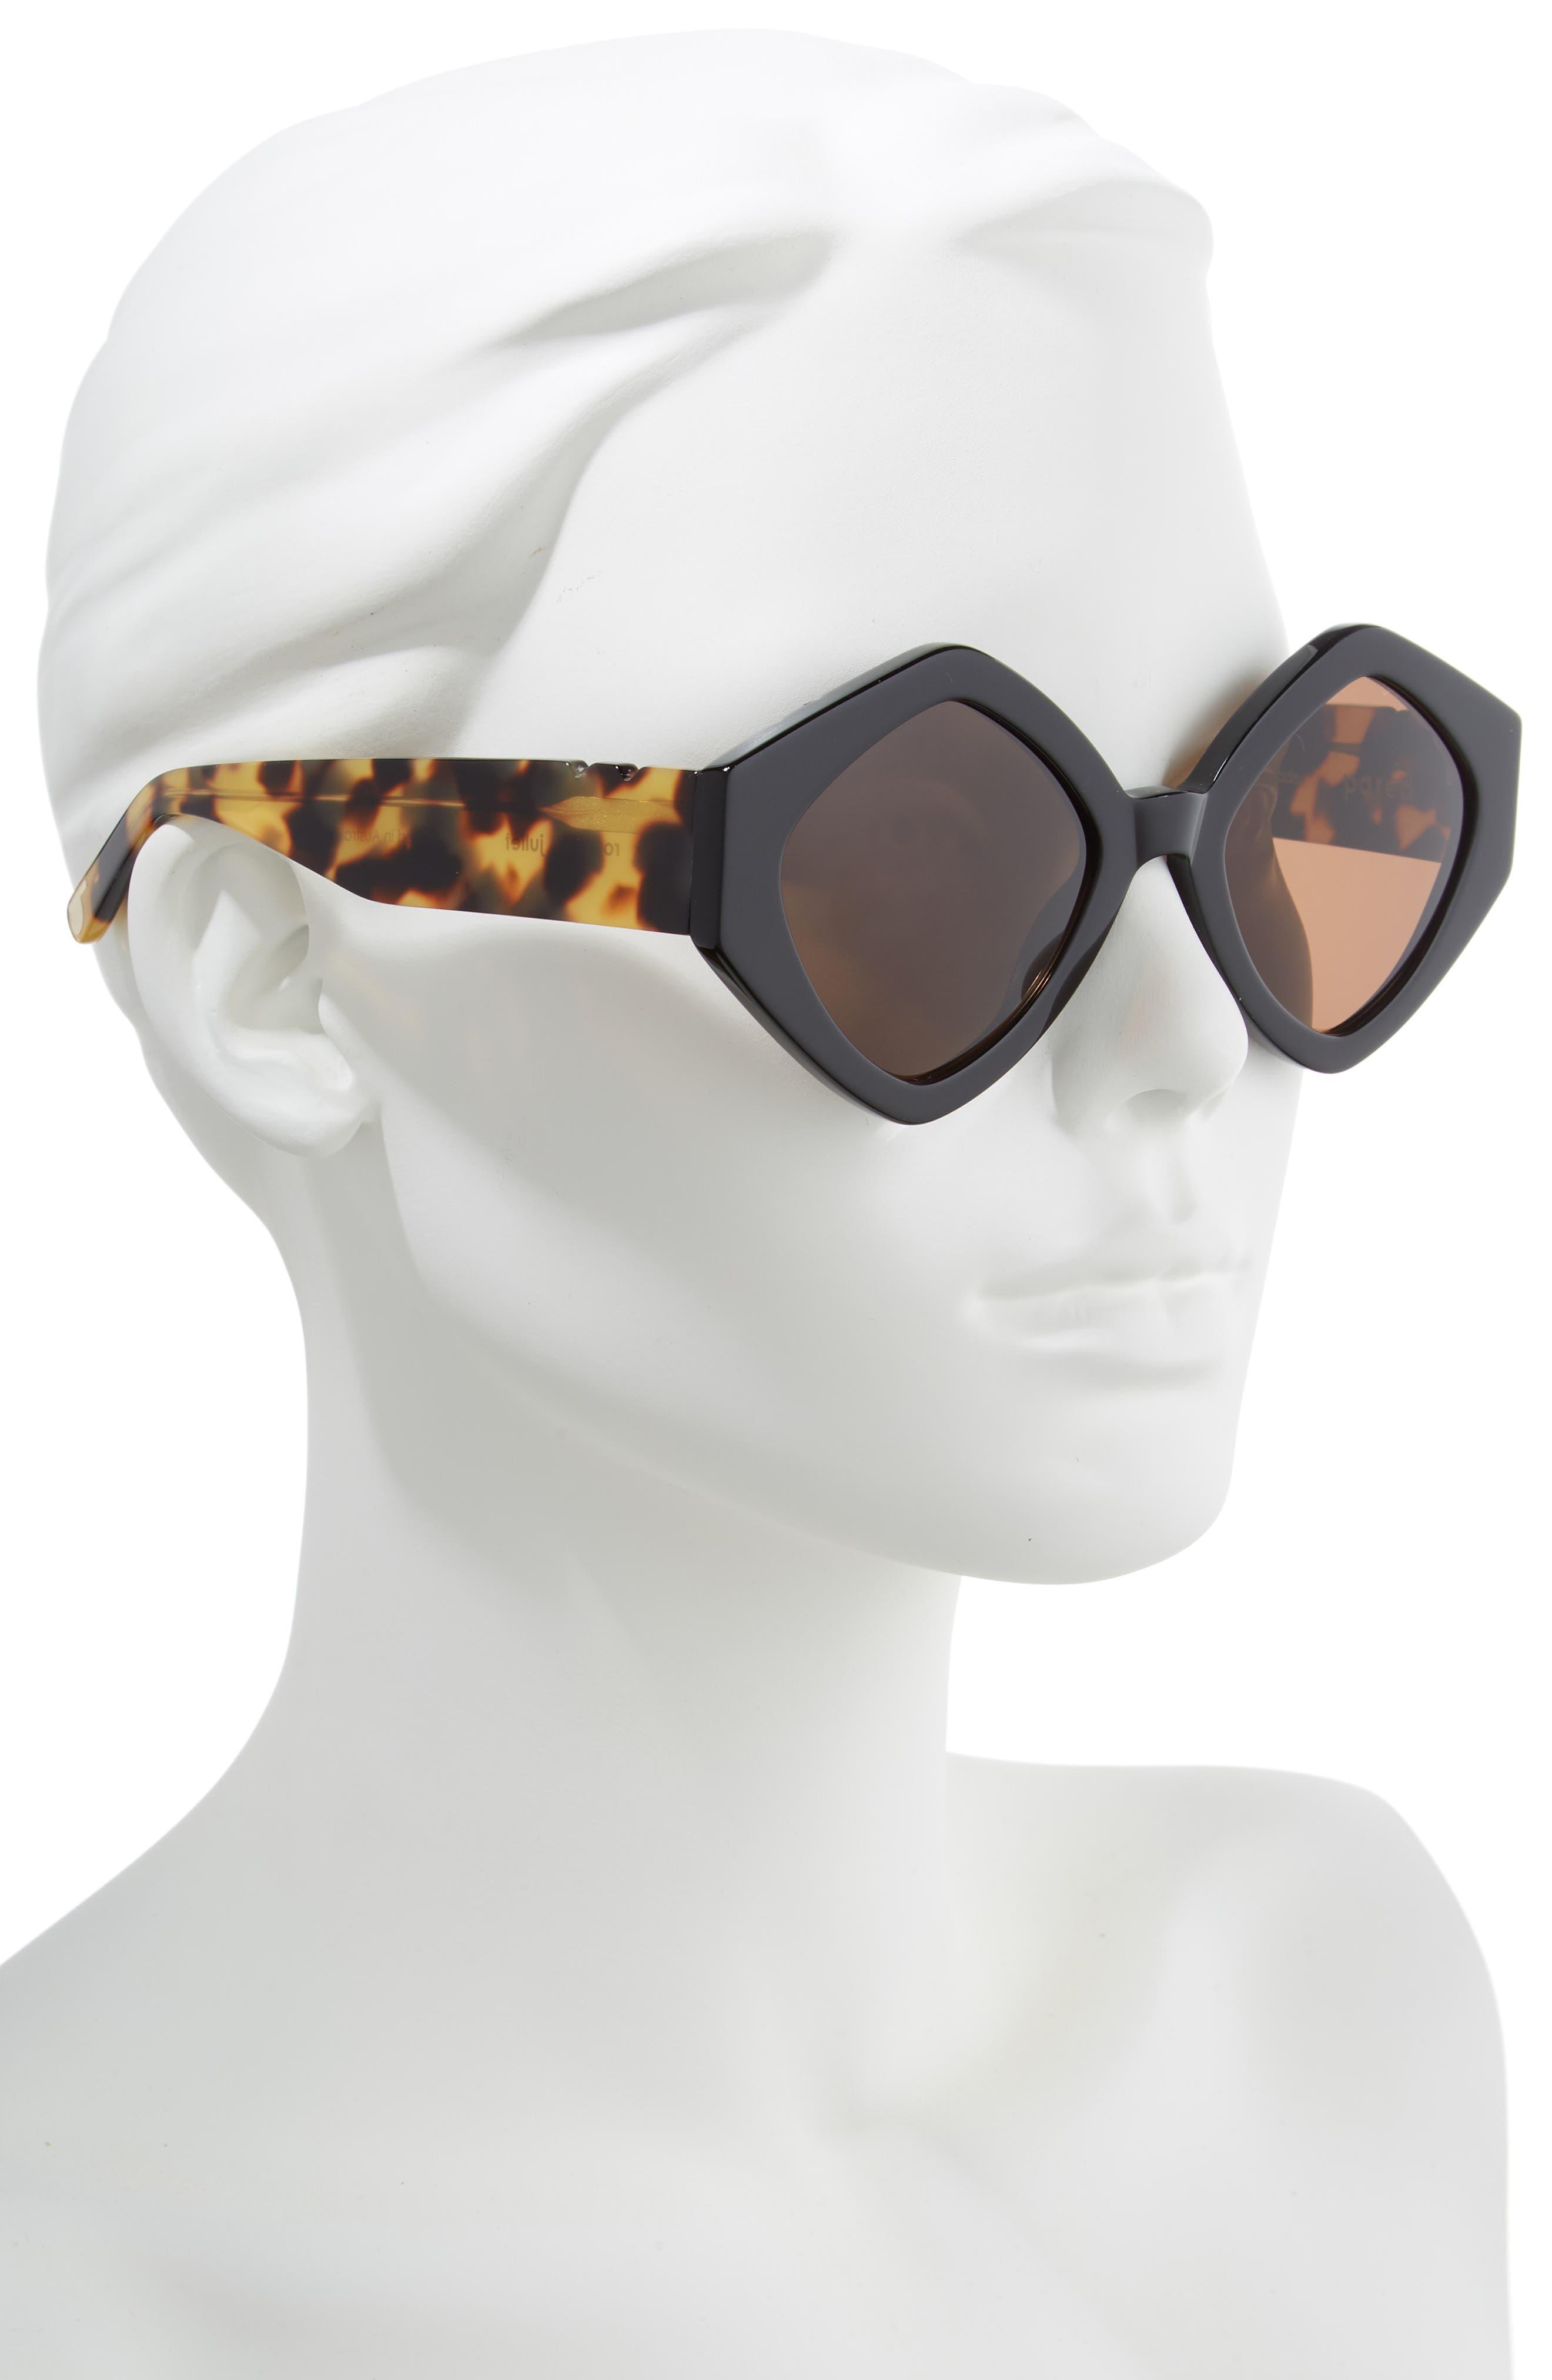 Romeo & Juliet 52mm Sunglasses,                             Alternate thumbnail 2, color,                             BLACK SOLID BROWN LENSES